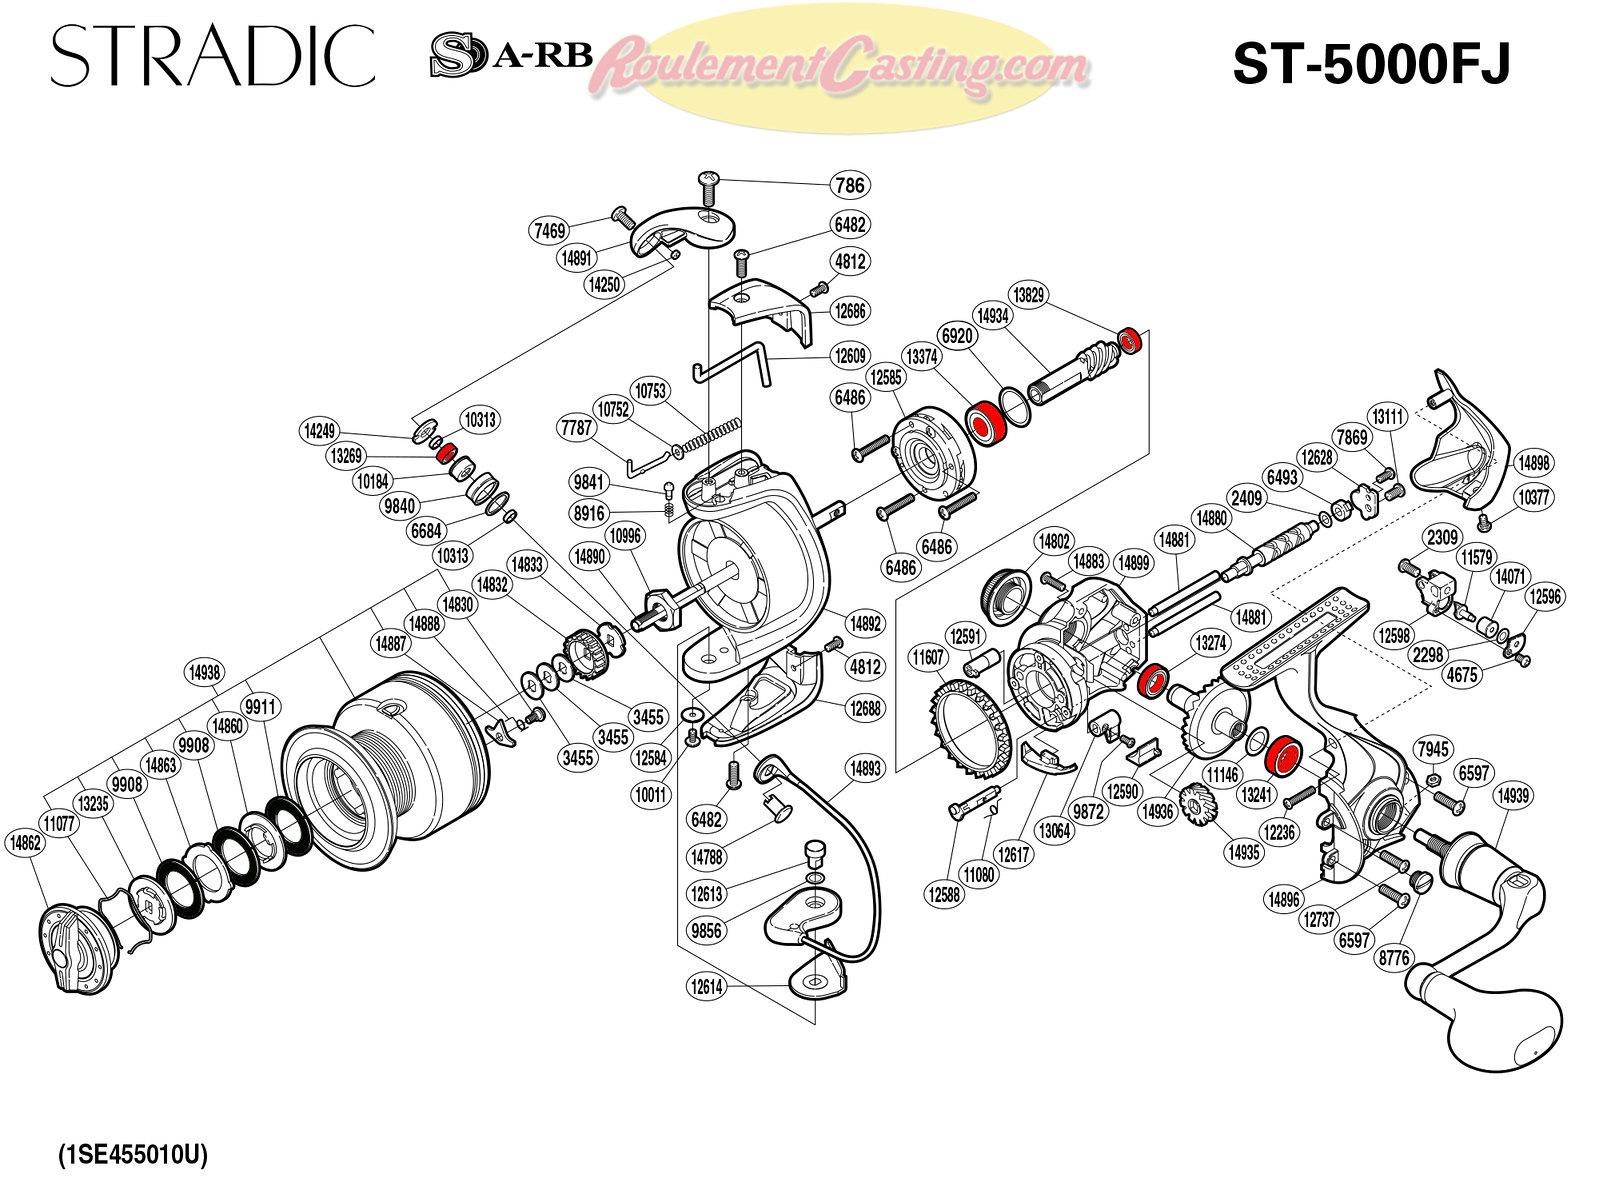 Schema-Stradic-5000FJ